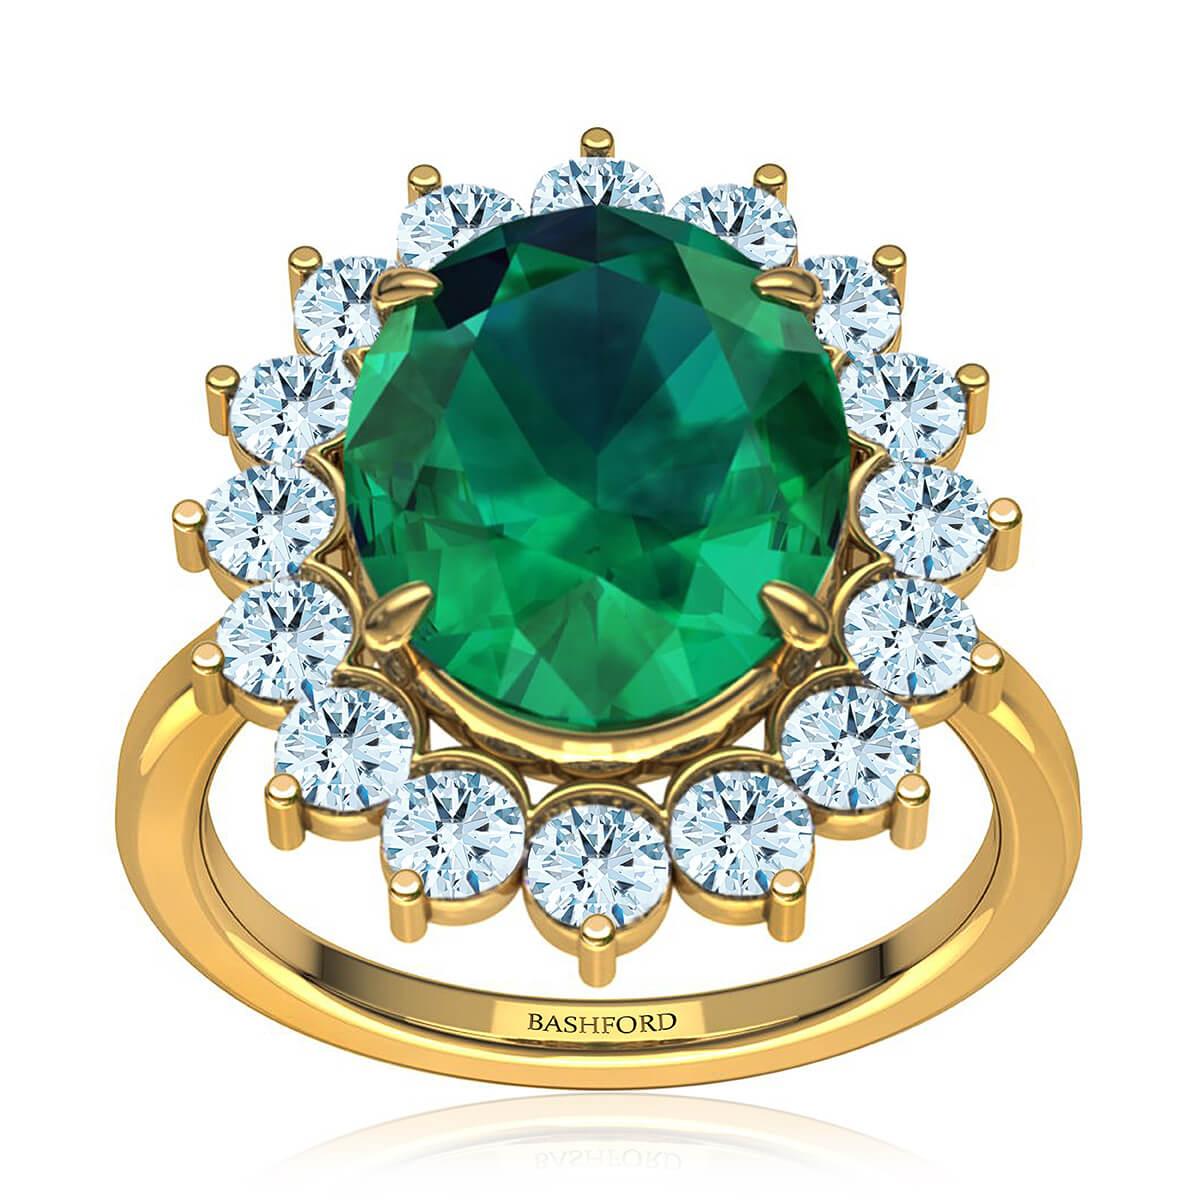 Maribel Emerald Ring (with 1 Carat Oval Emerald)